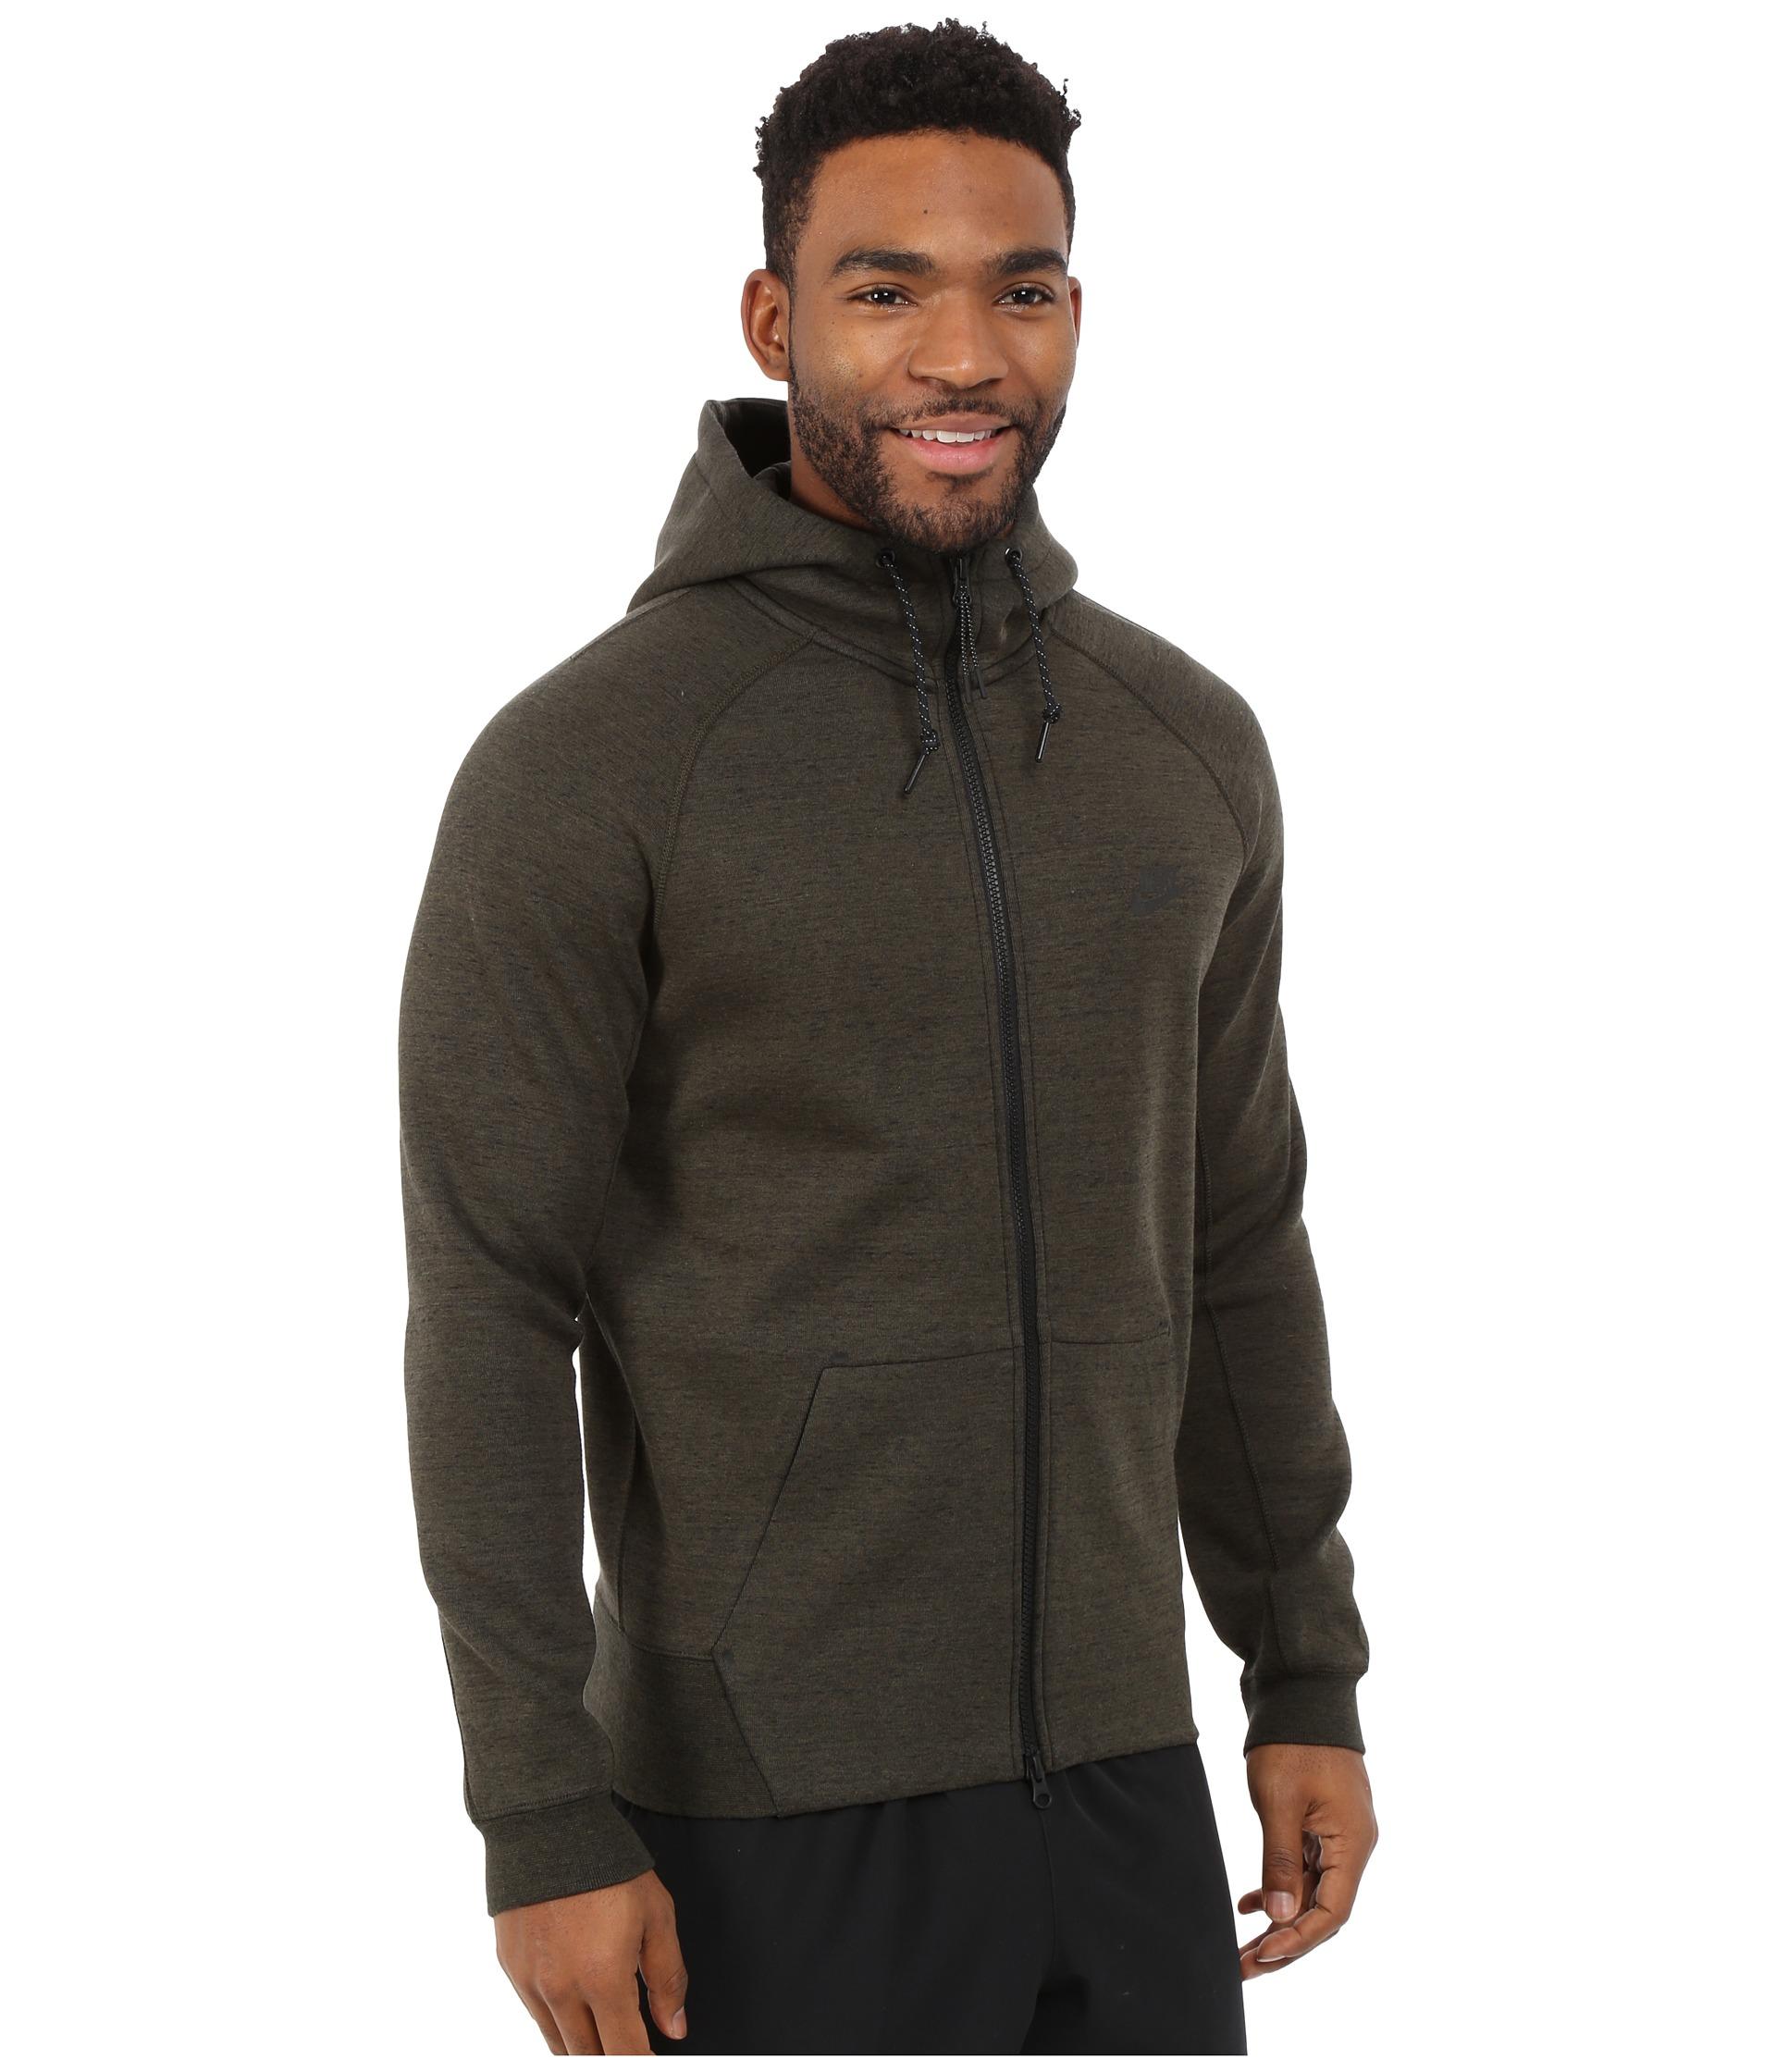 6042c271f268 Lyst - Nike Tech Fleece Aw77 1.0 Full-zip Hoodie in Natural for Men